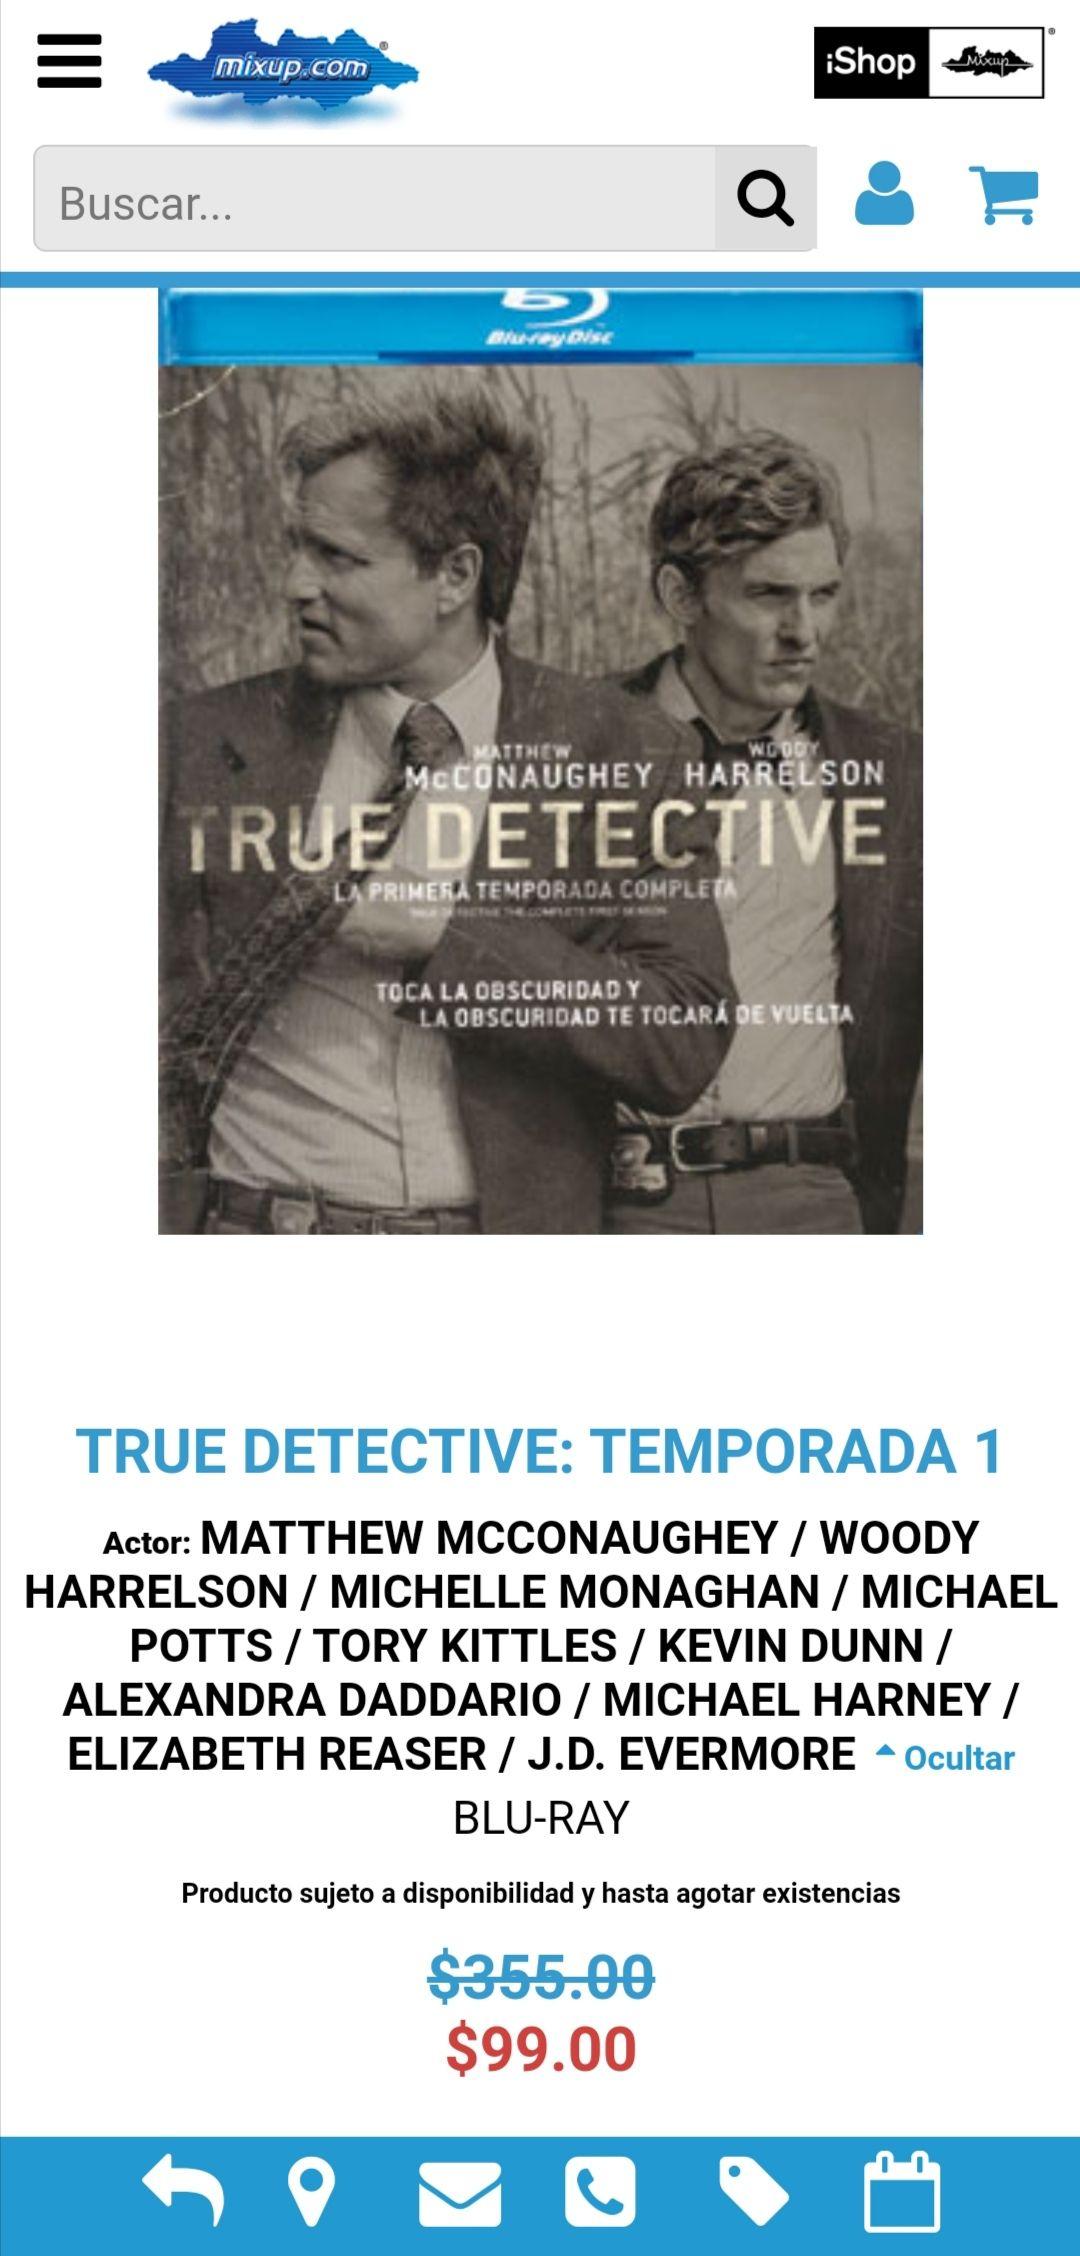 Mixup: True detective Blu-ray temporada 1